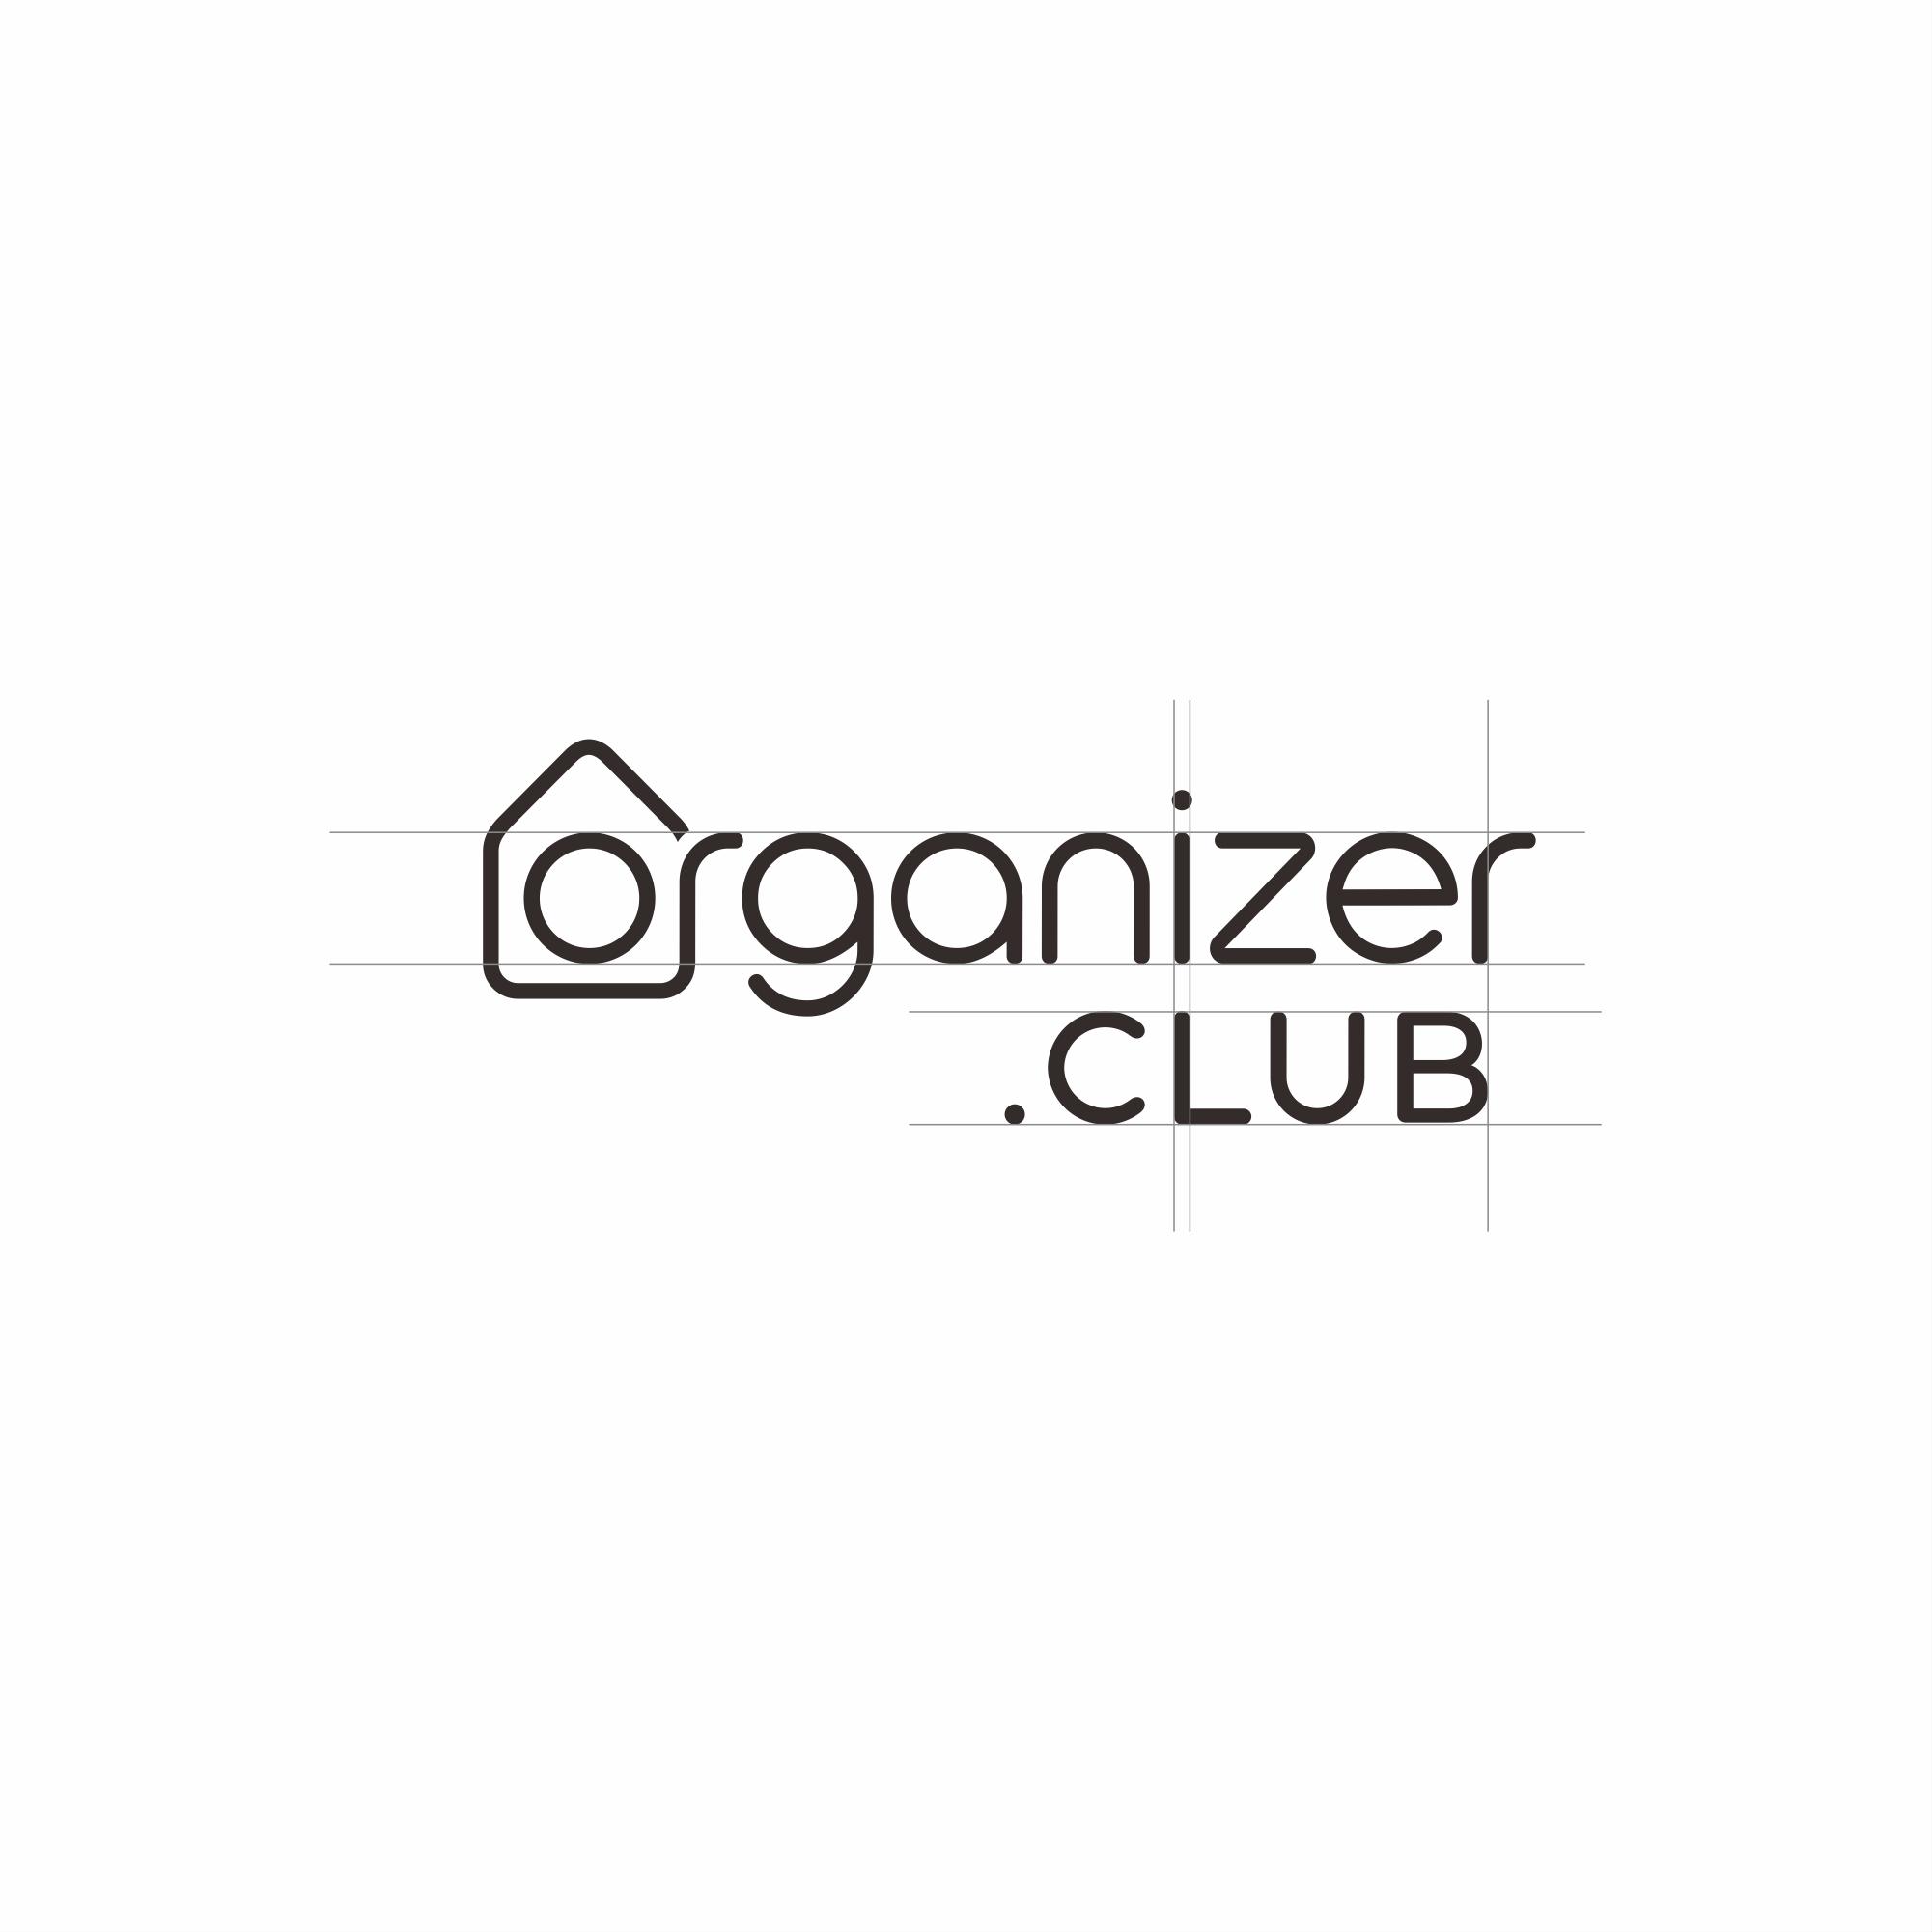 Organizer.Club needs a clean, simple, and modern logo